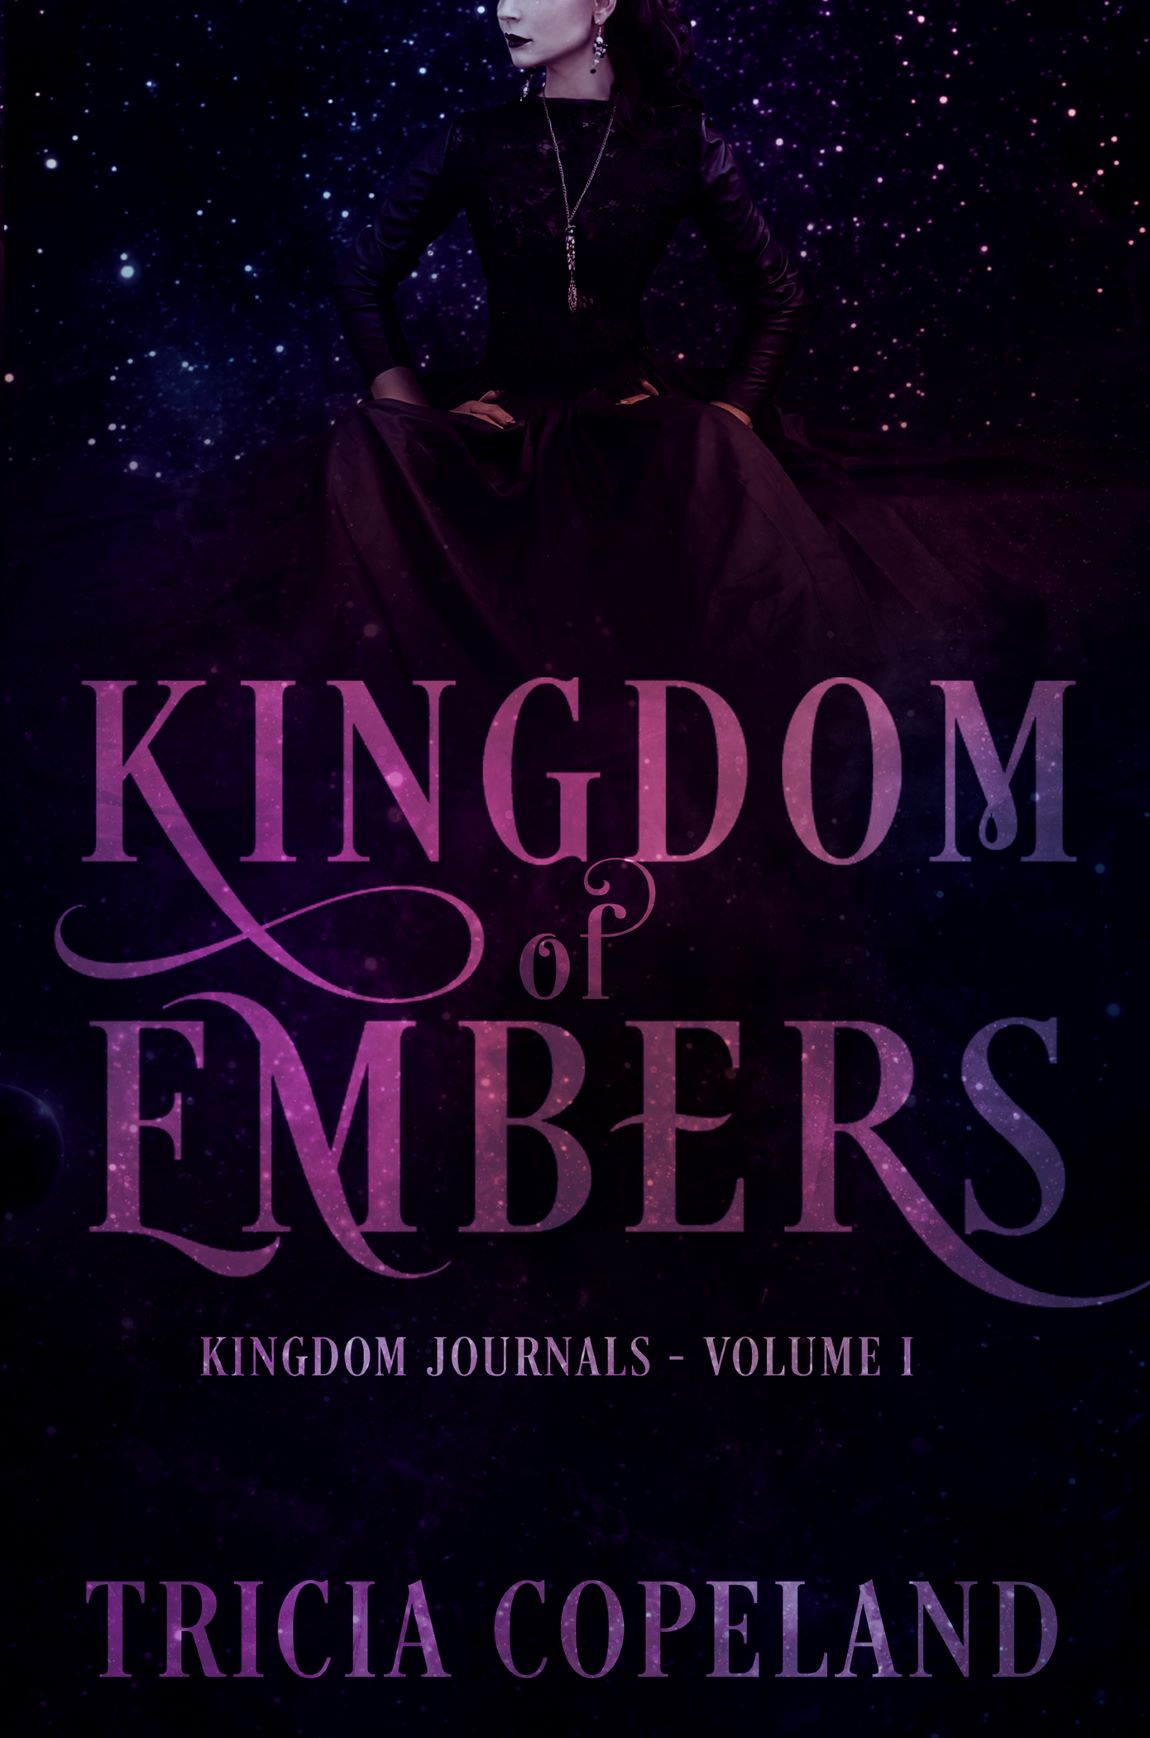 KingdomofEmbers-HR-Cover_resize.jpg